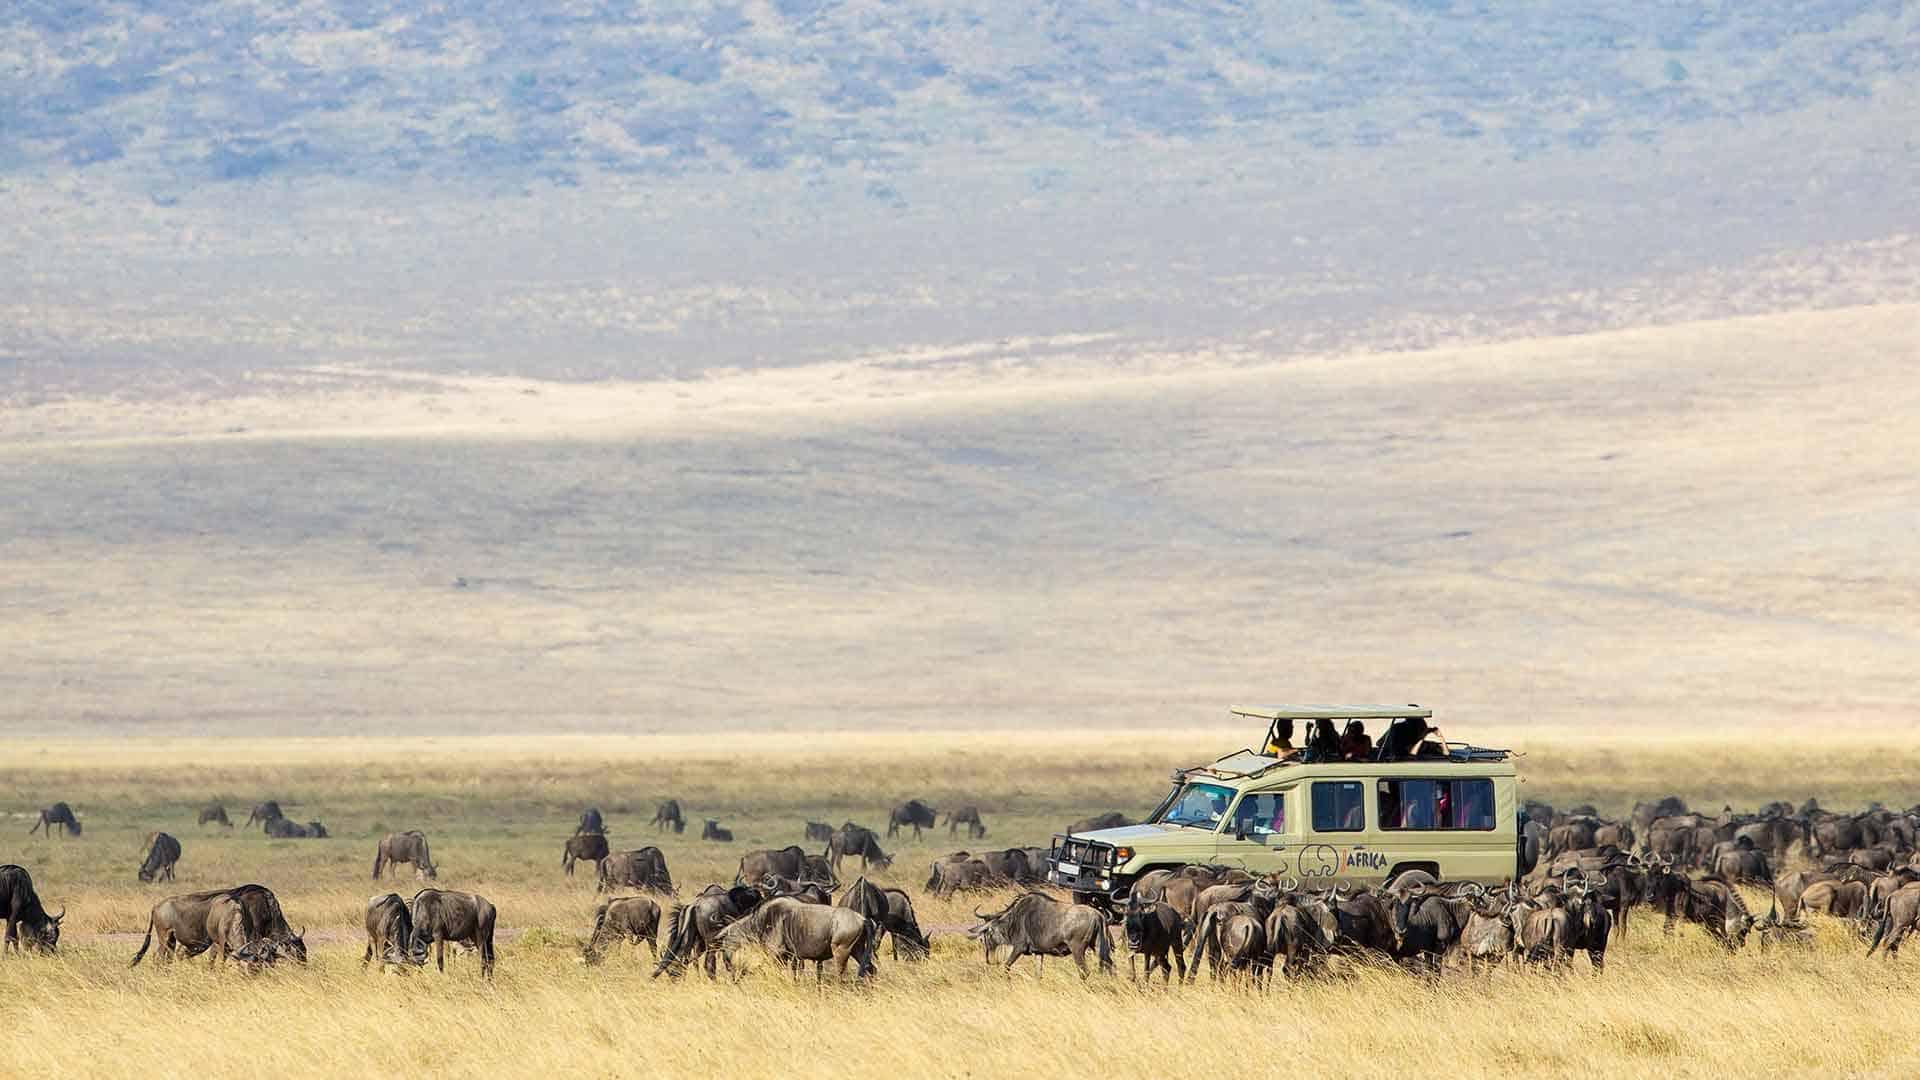 Eco tourisim in the Serengeti